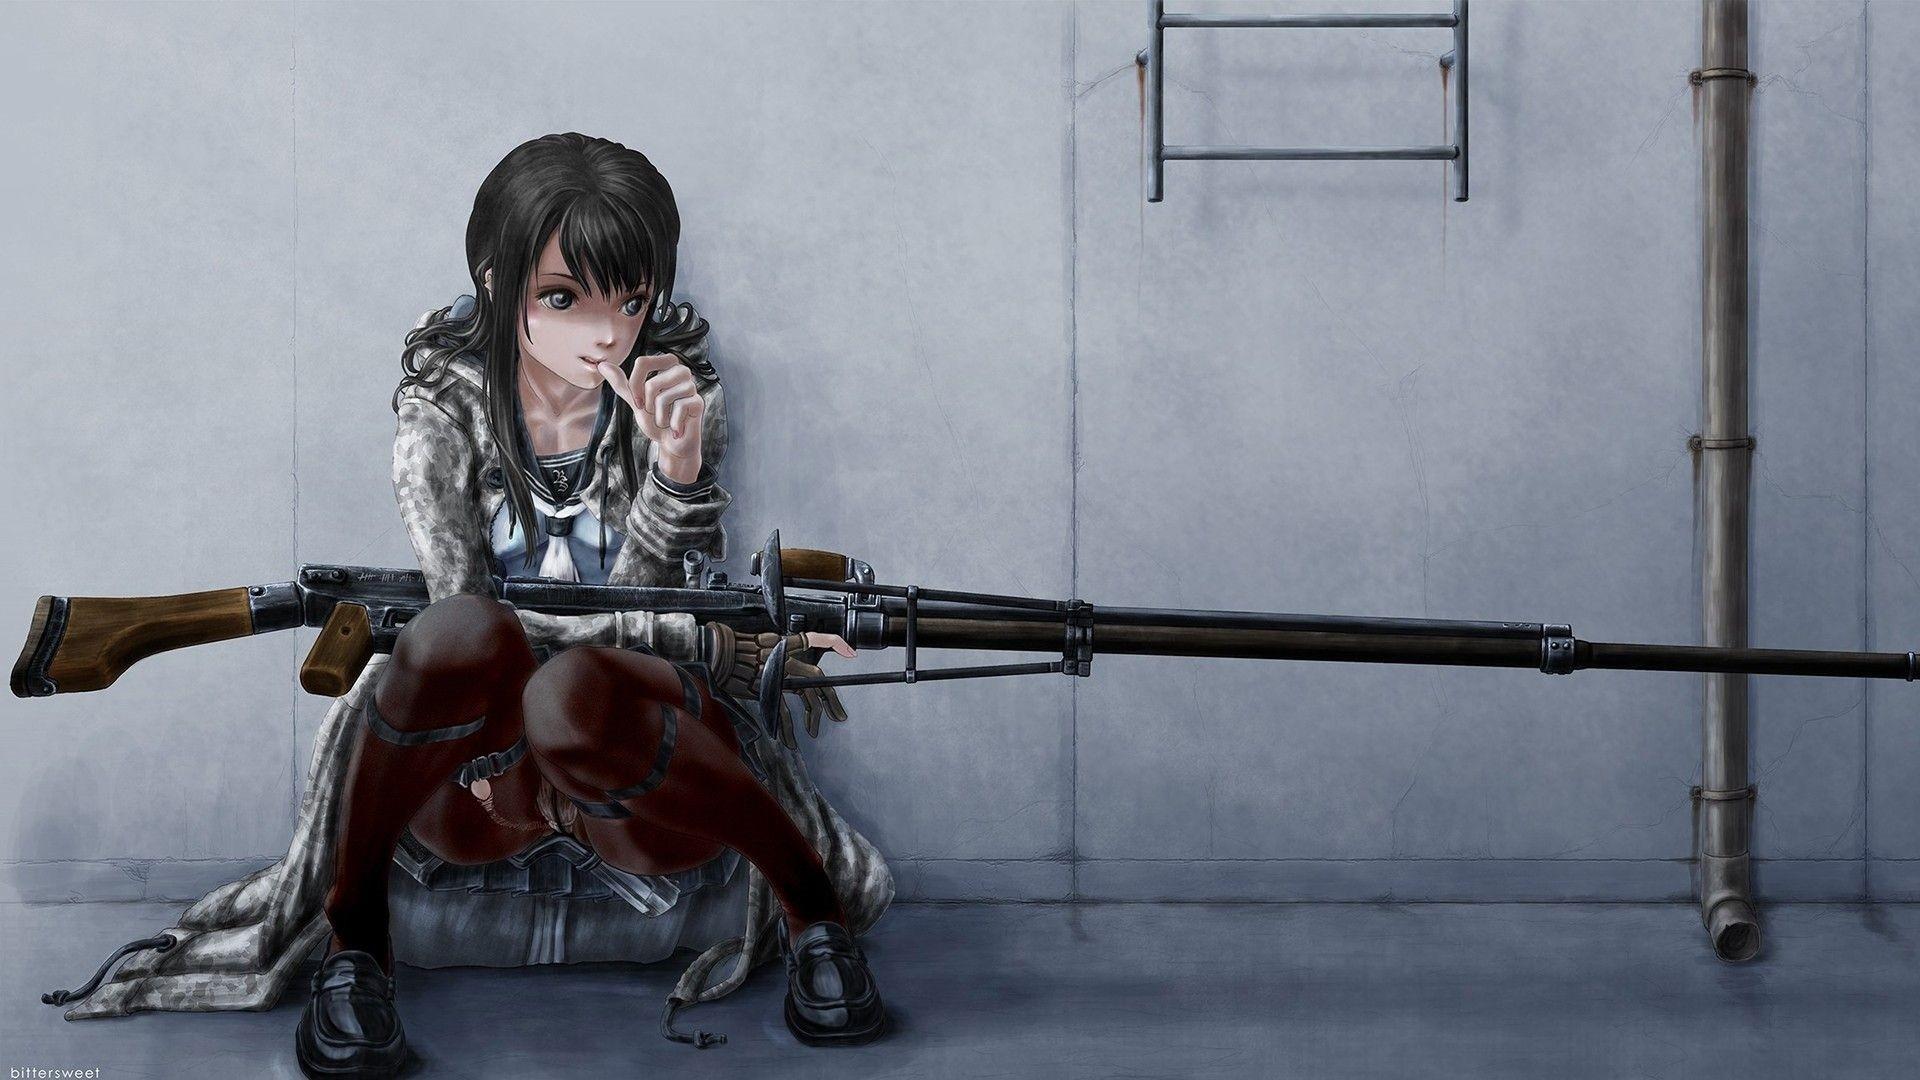 Anime Girls With Guns Wallpaper Download